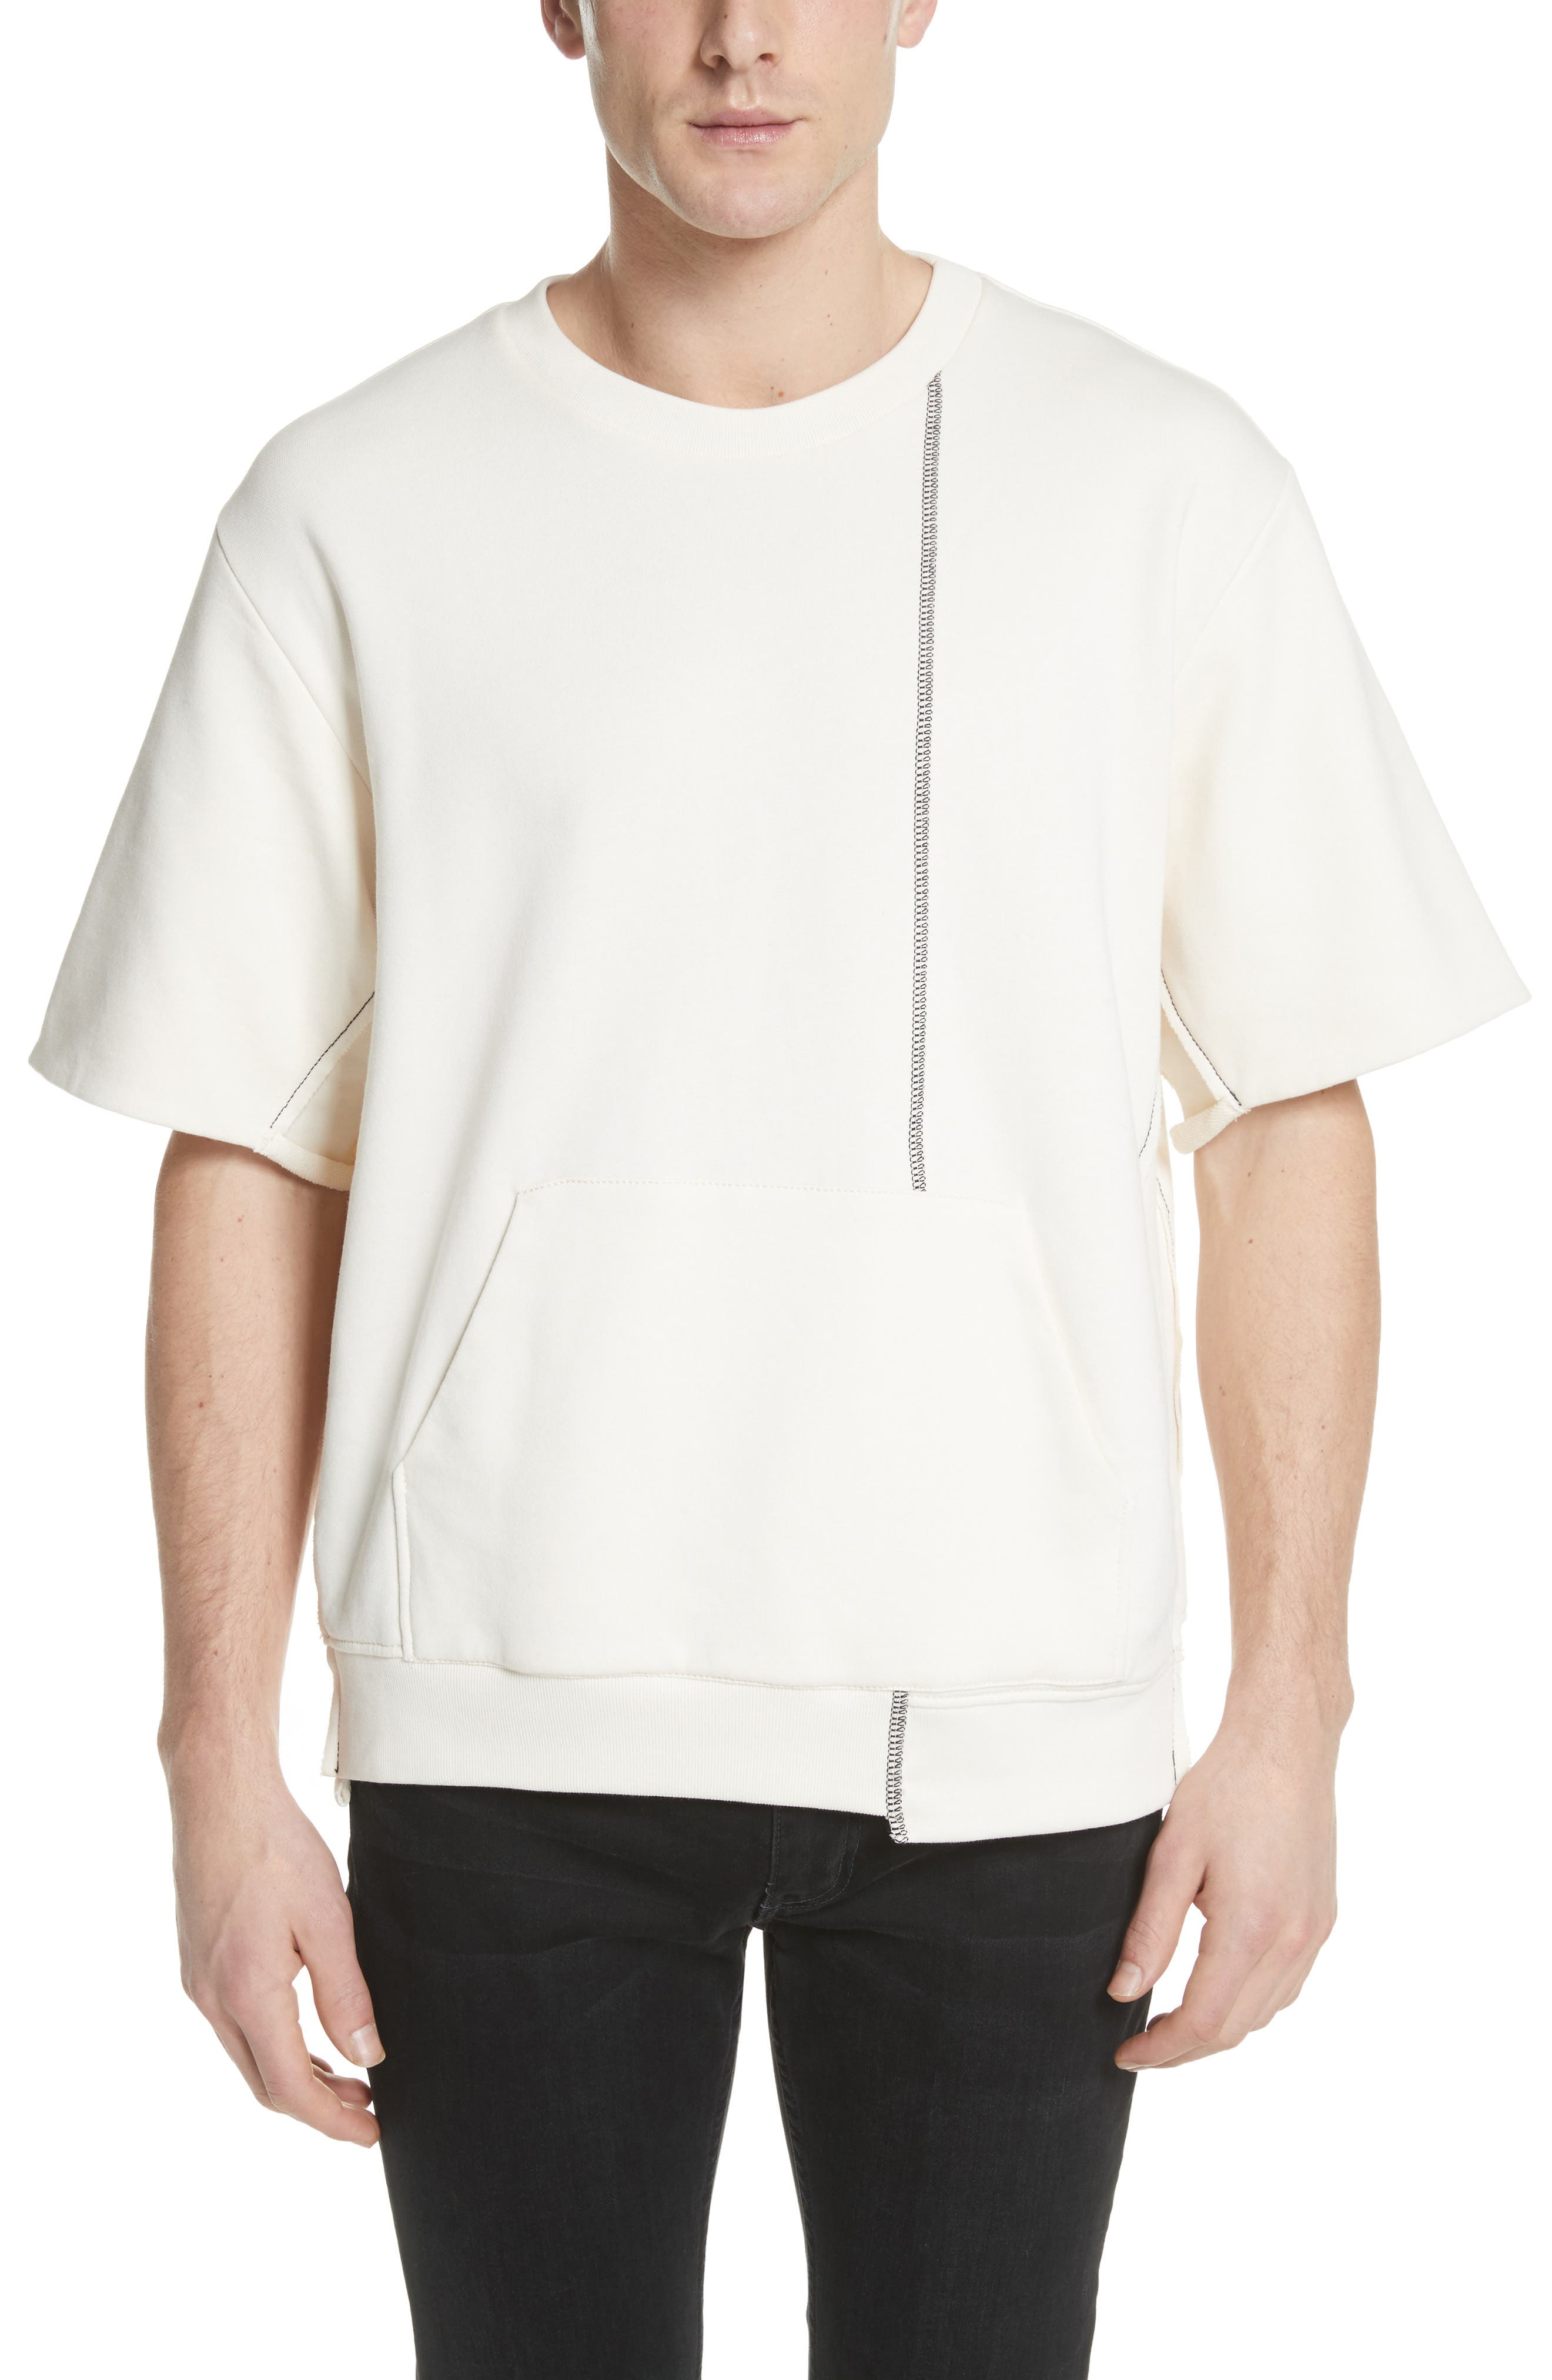 3.1 Phillip Lim Reconstructed Short Sleeve Sweatshirt